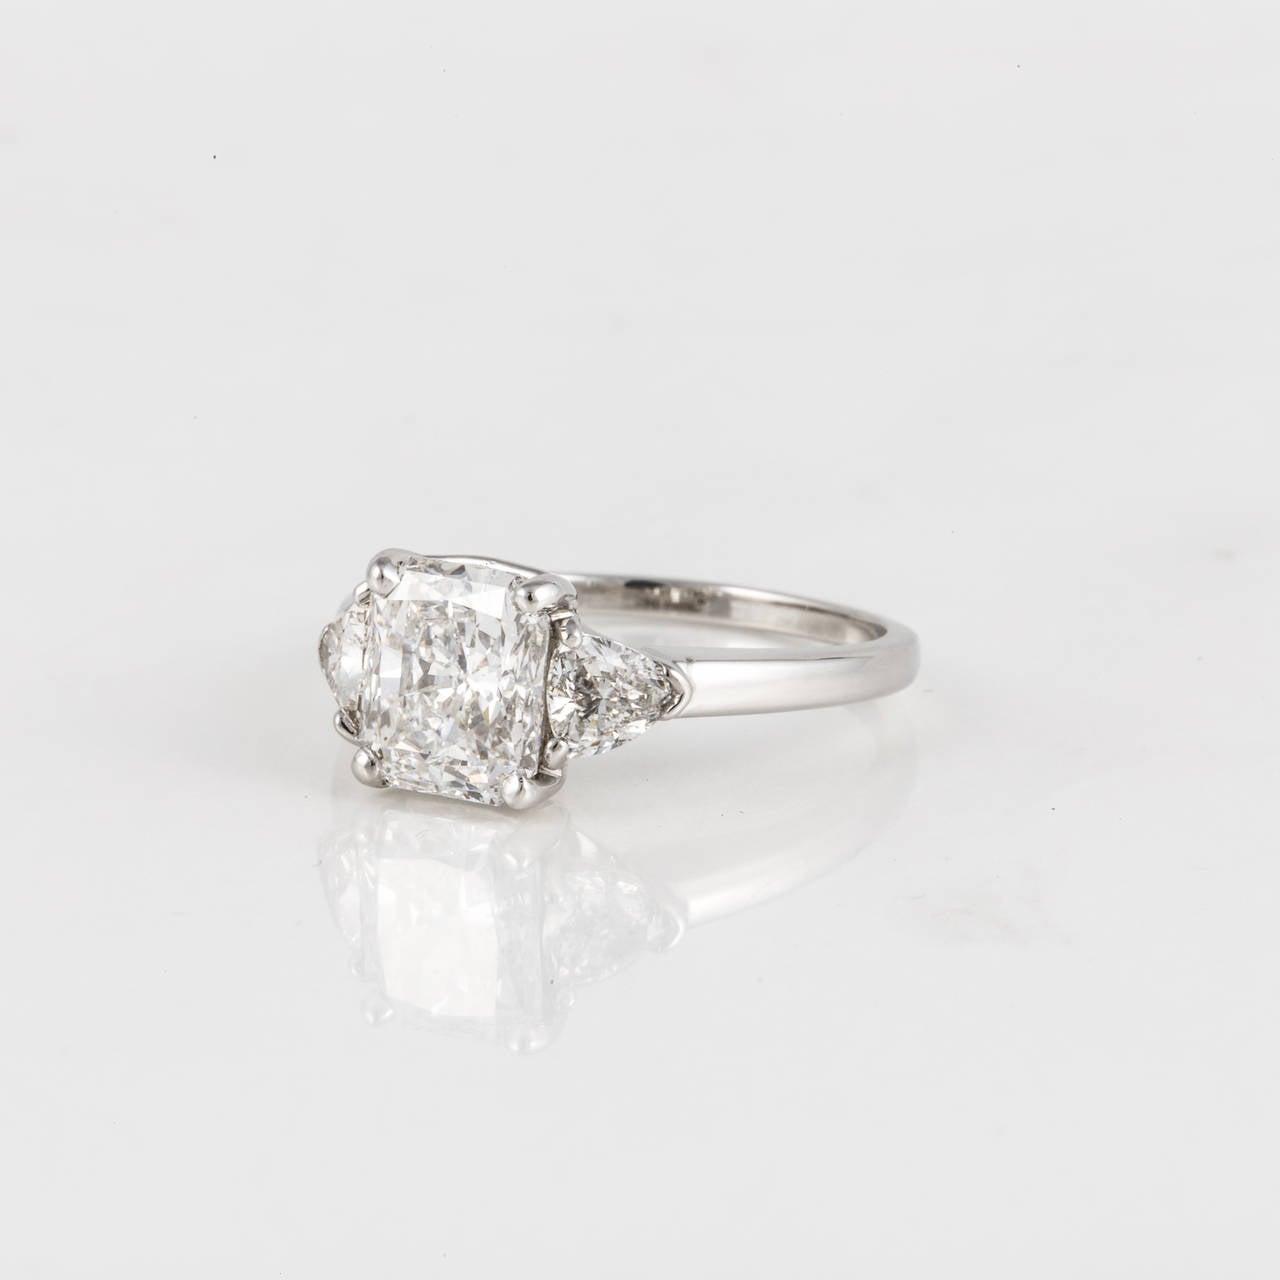 Cartier Radiant Cut Diamond Platinum Three Stone Ring 2